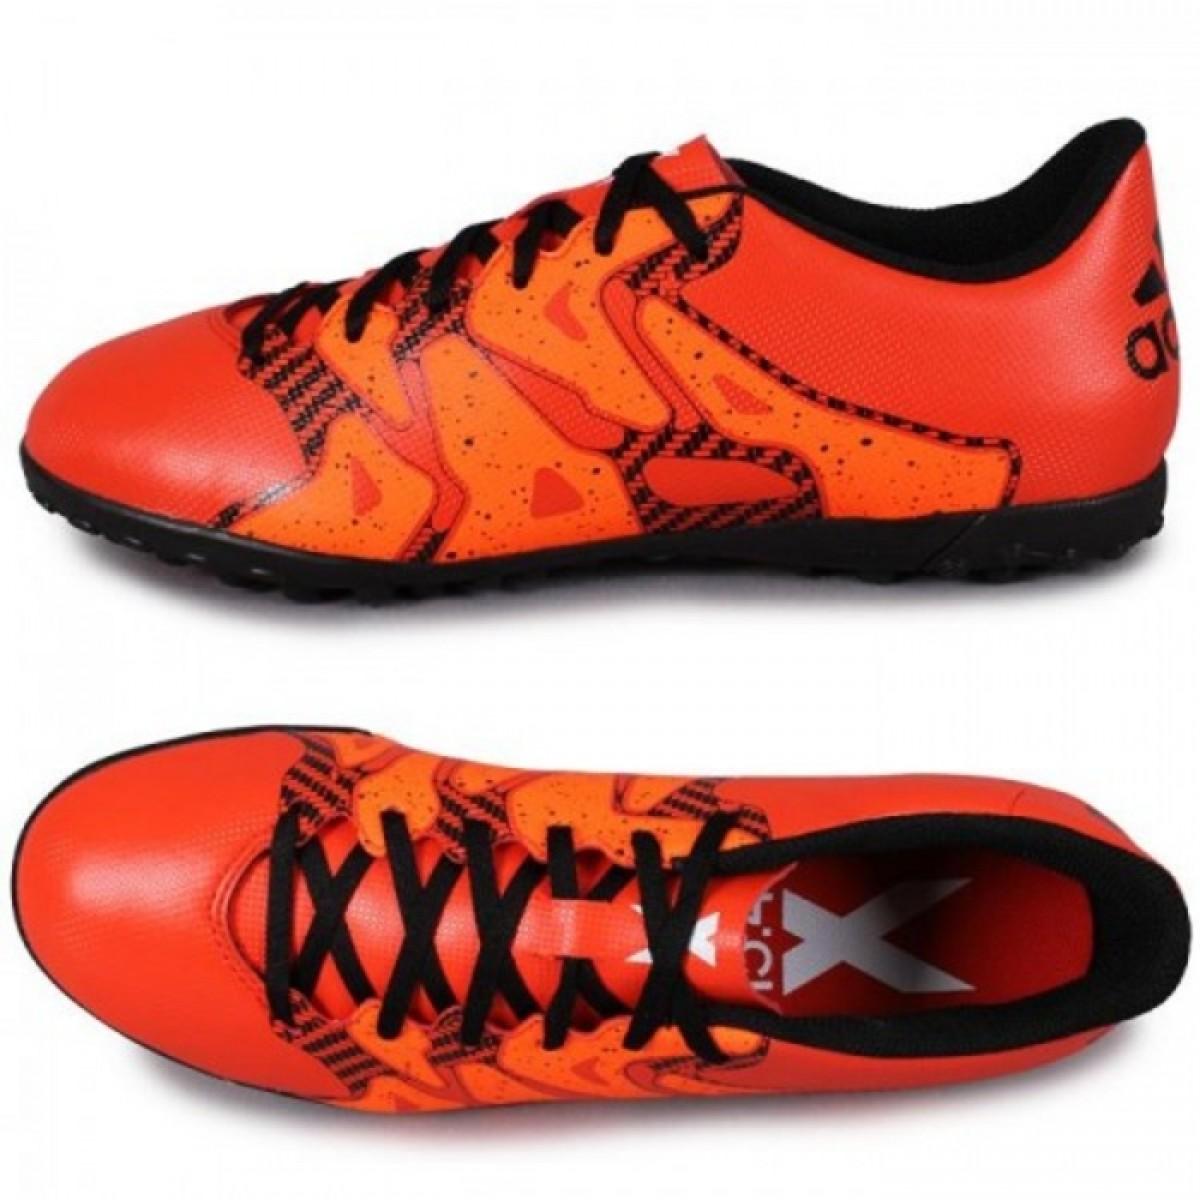 24c94c4c79 ... Chuteira Society Adidas X 15.4 TF Masculina - Laranja ...